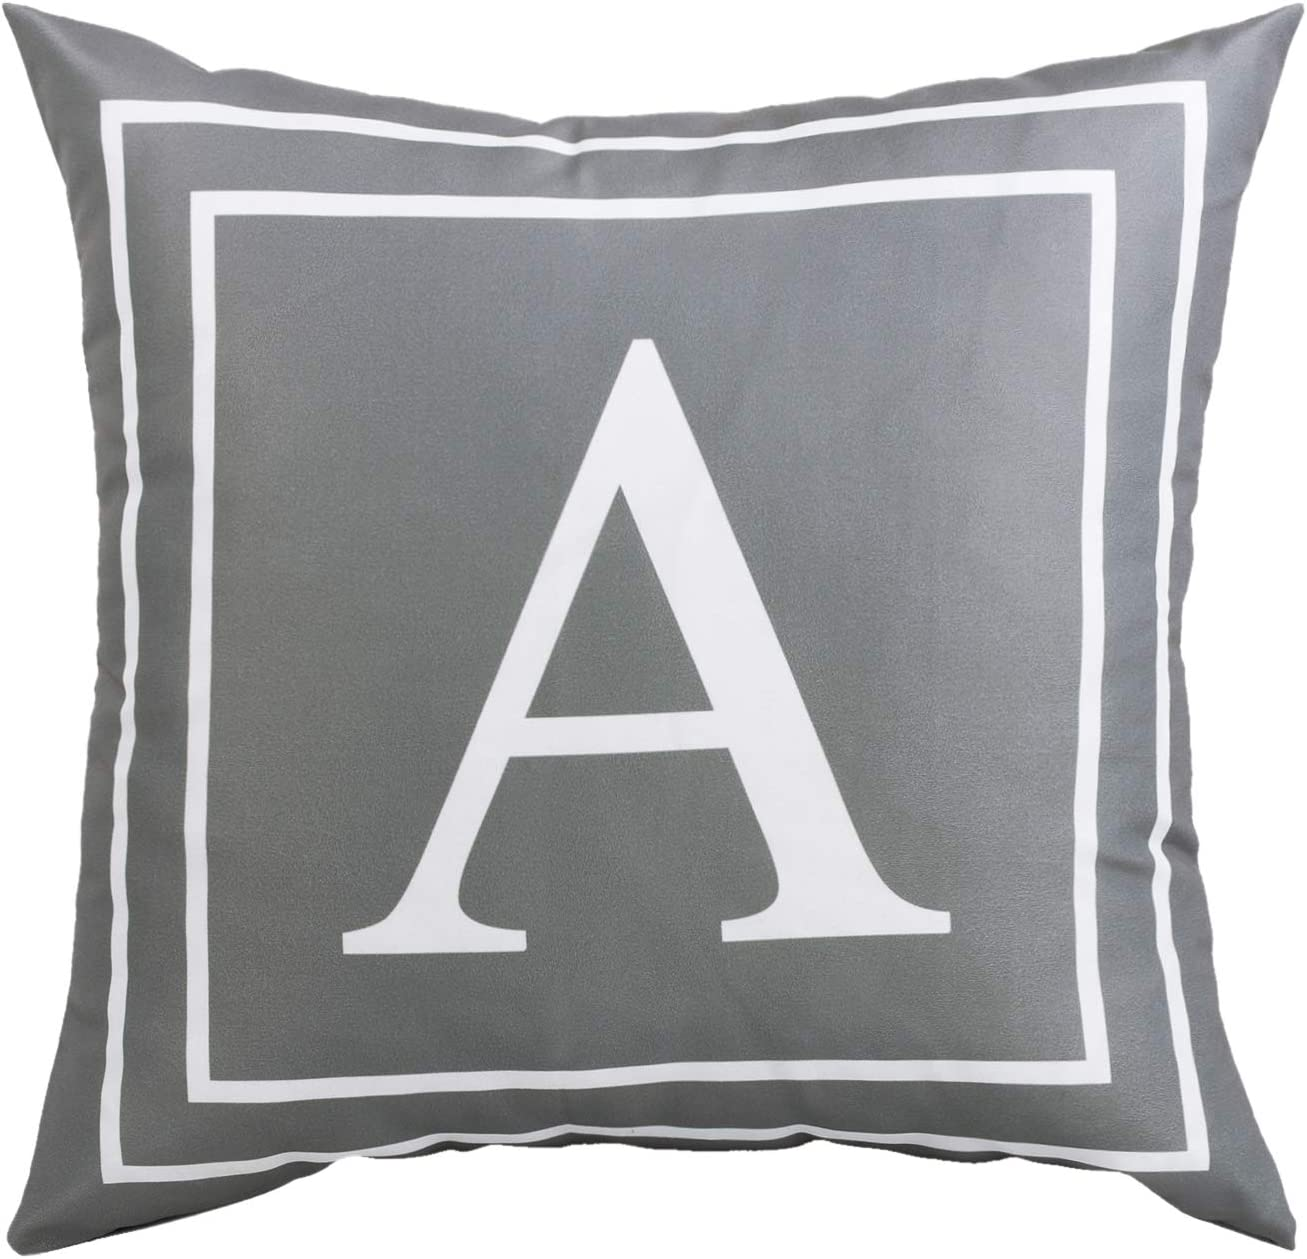 Fascidorm Gray Pillow Cover English Alphabet A Throw Pillow Case Modern Cushion Cover Square Pillowcase Decoration for Sofa Bed Chair Car 16 x 16 Inch